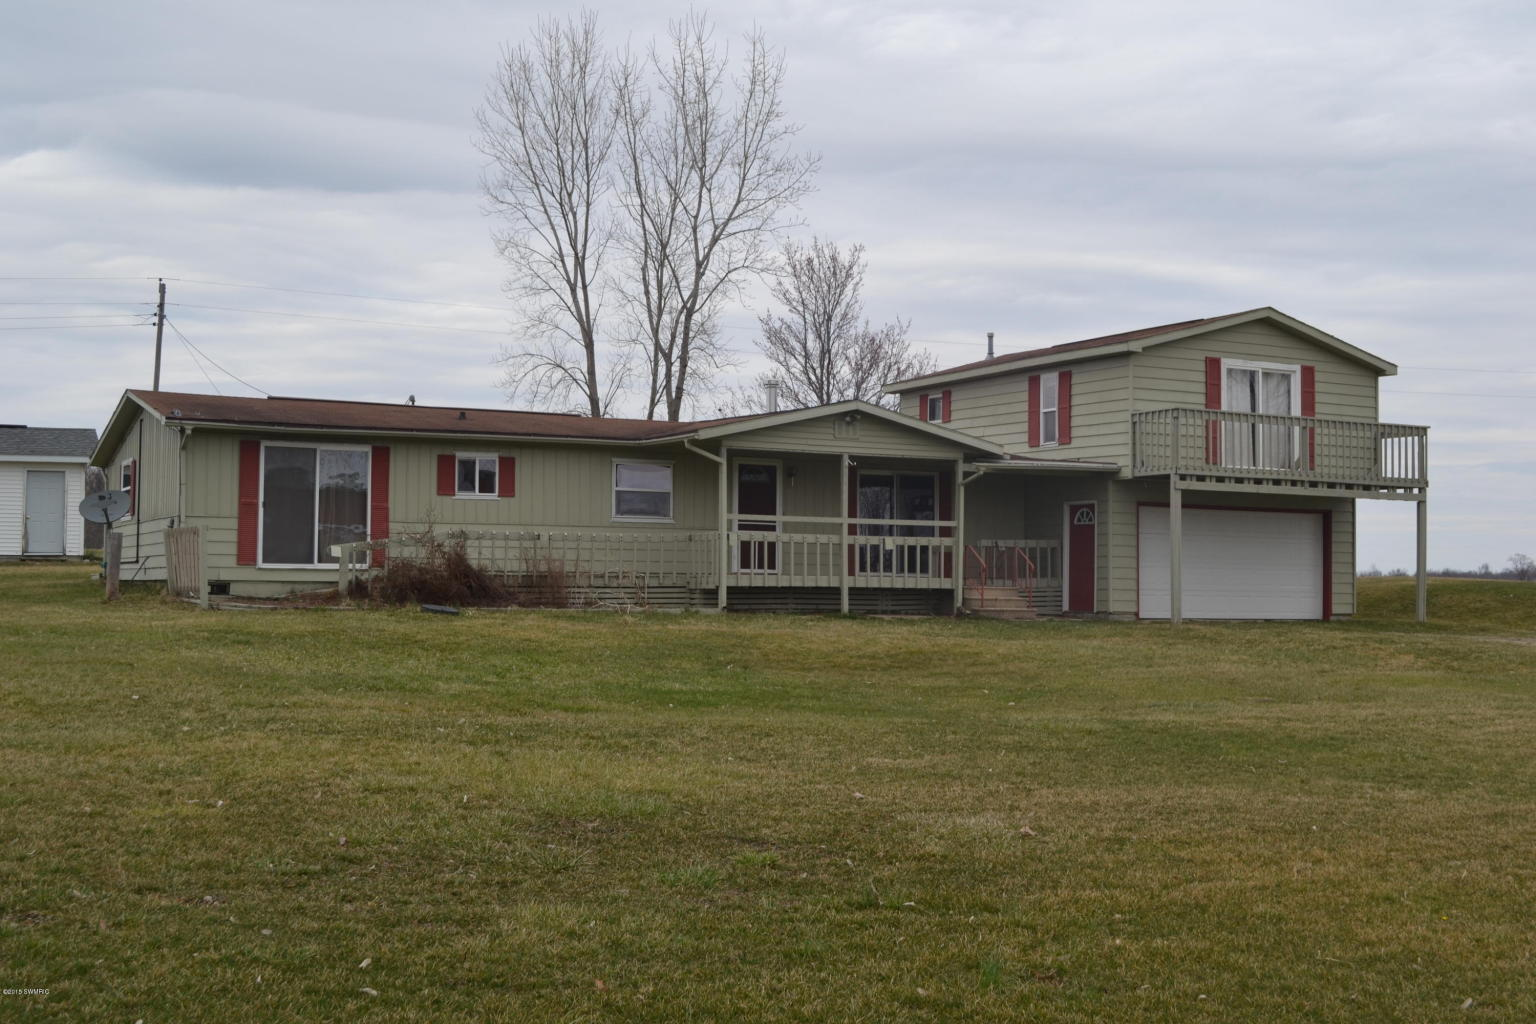 1471 W Olive Branch Road, Galien, Michigan 49113